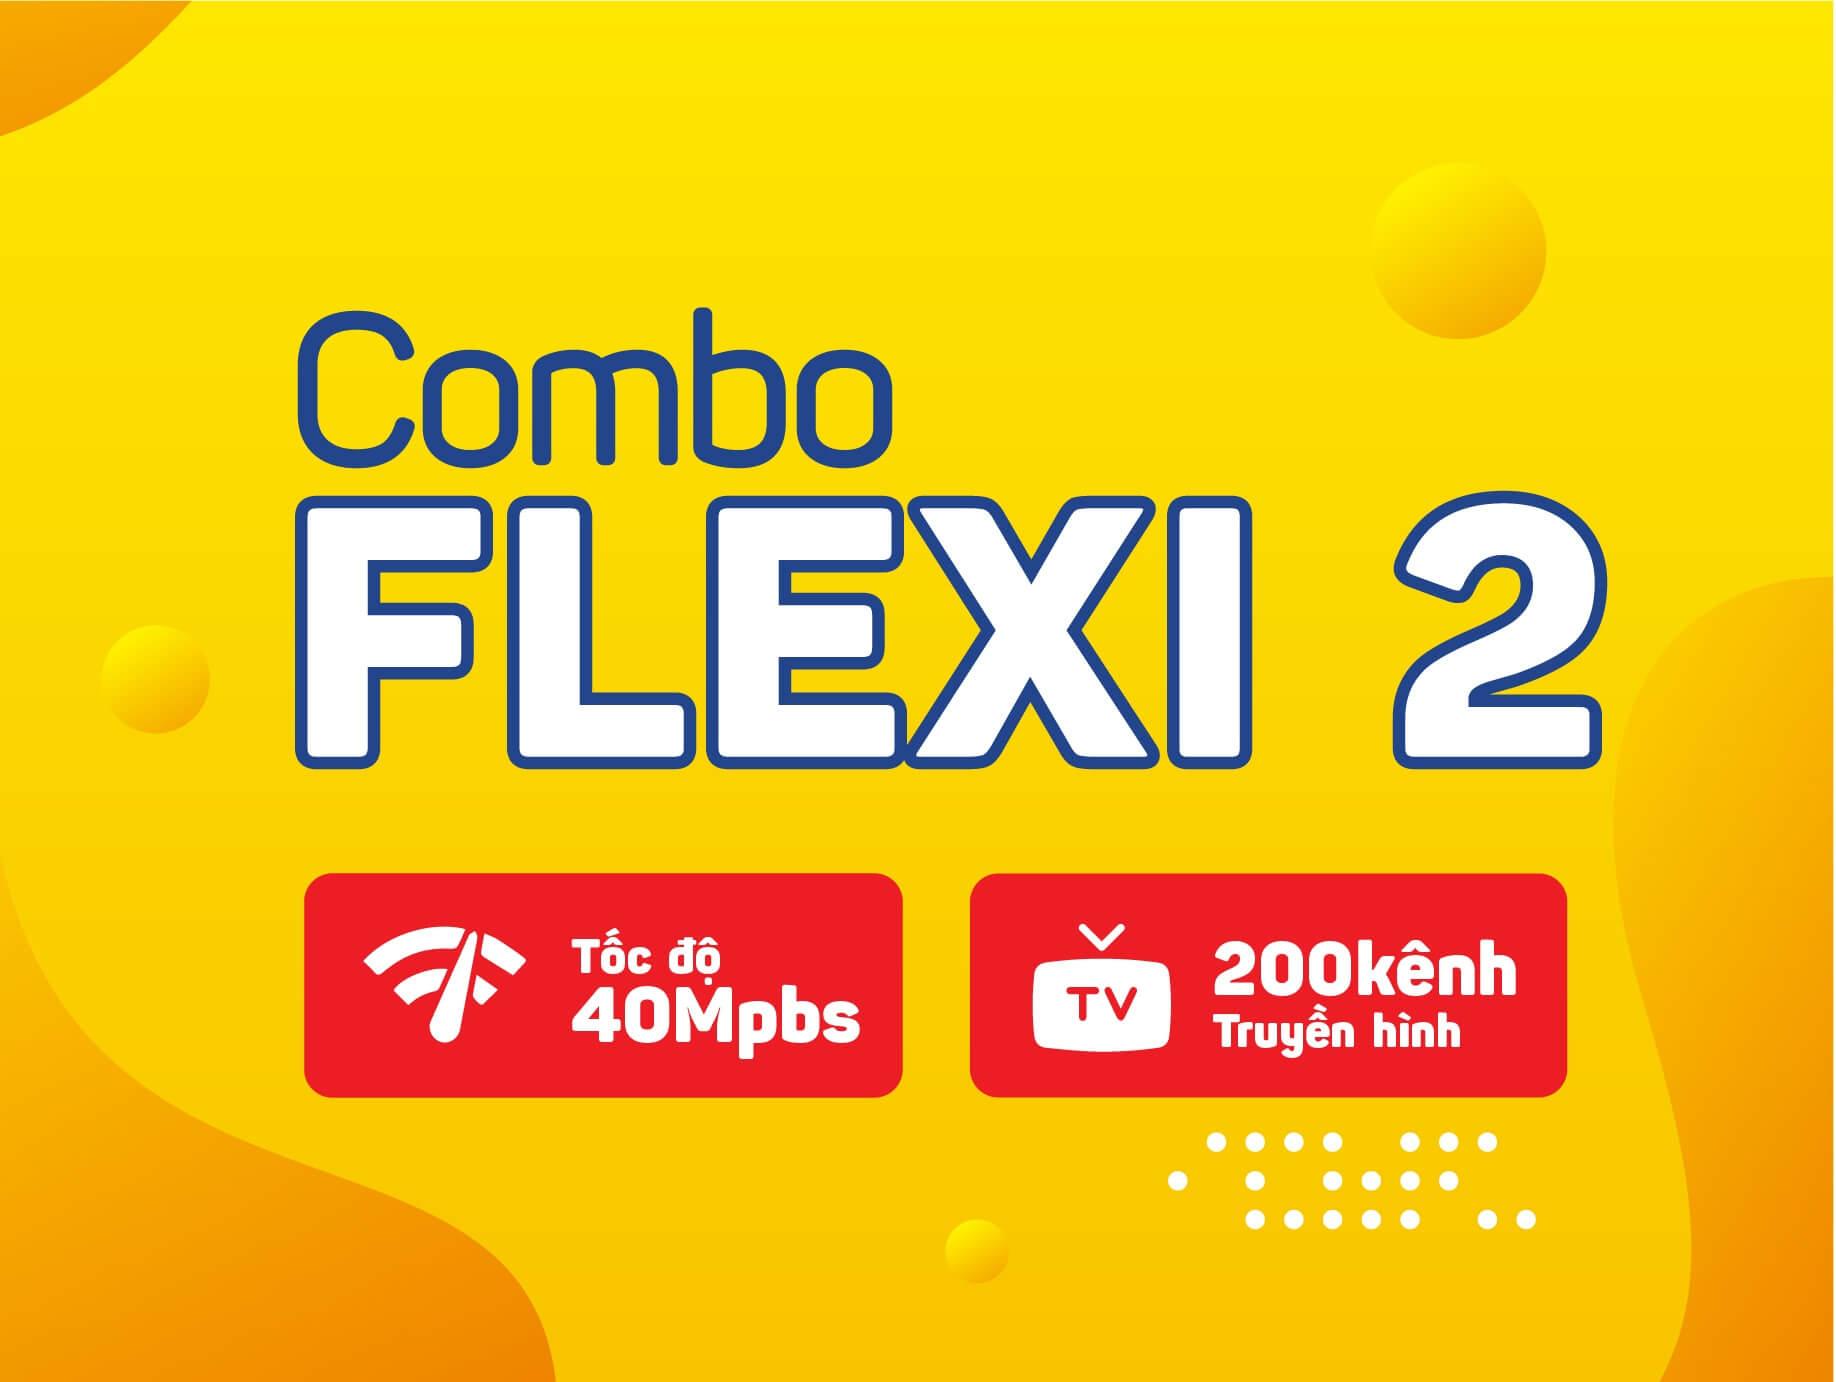 Combo Internet Truyền Hình Flexi 2